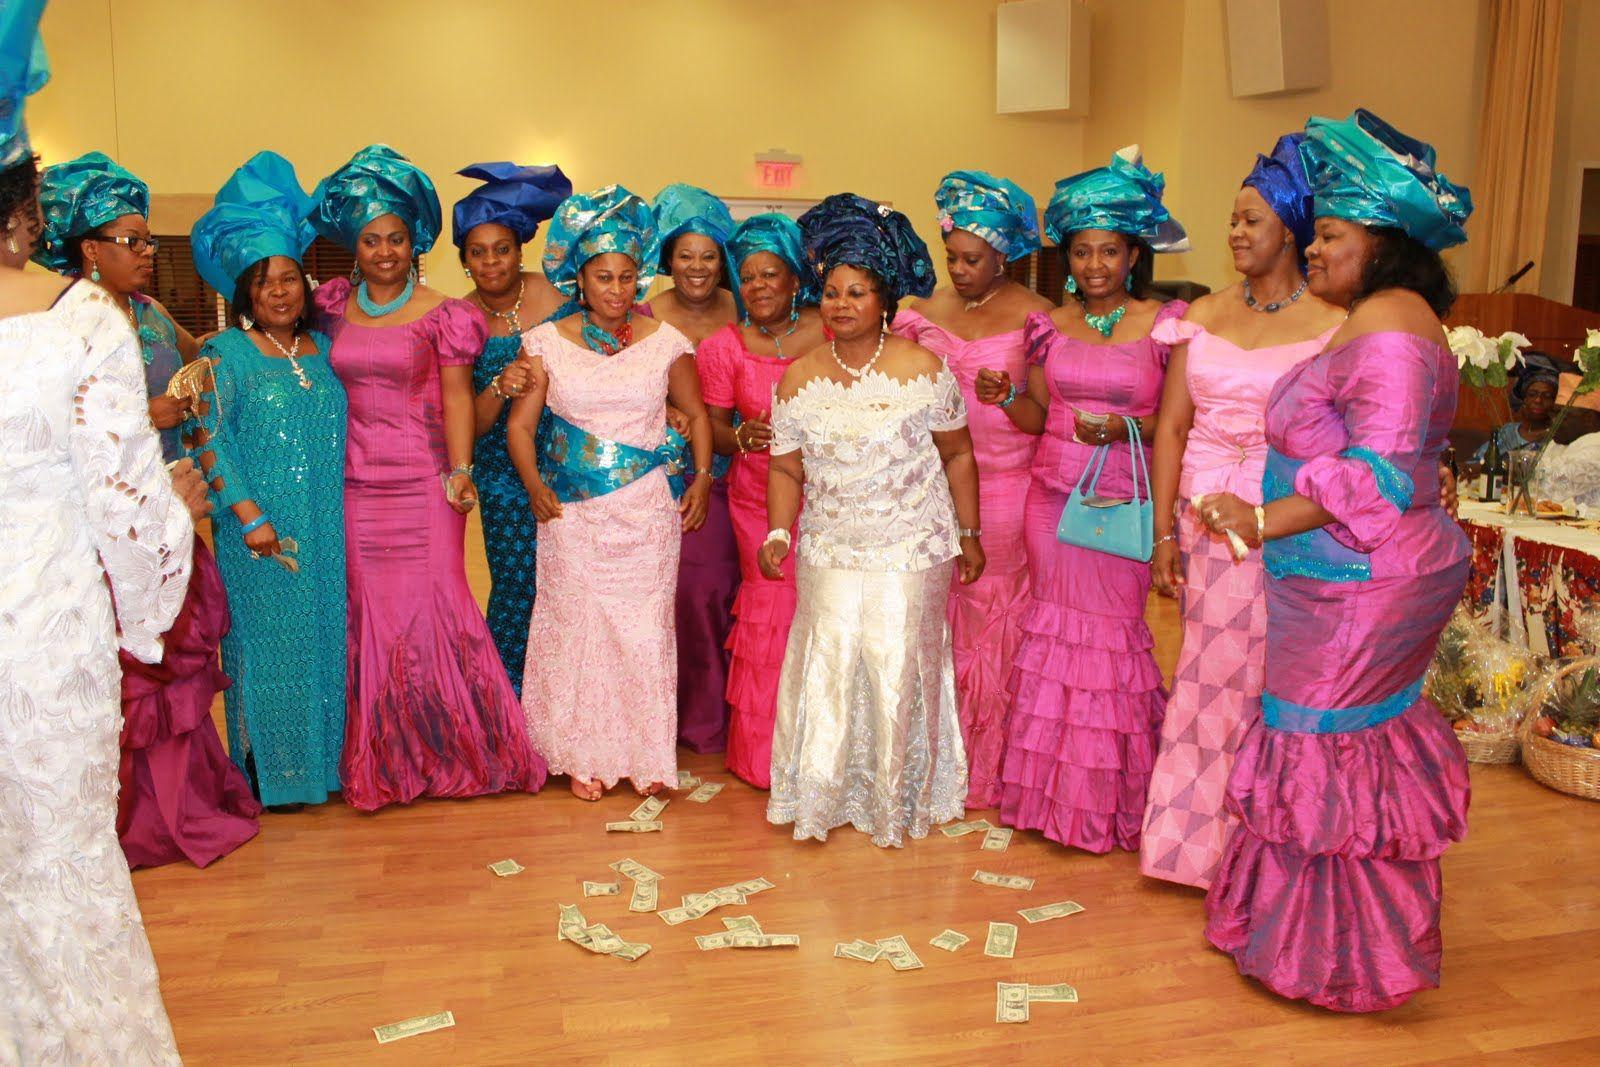 Nigerian Dress - Ask.com Image Search